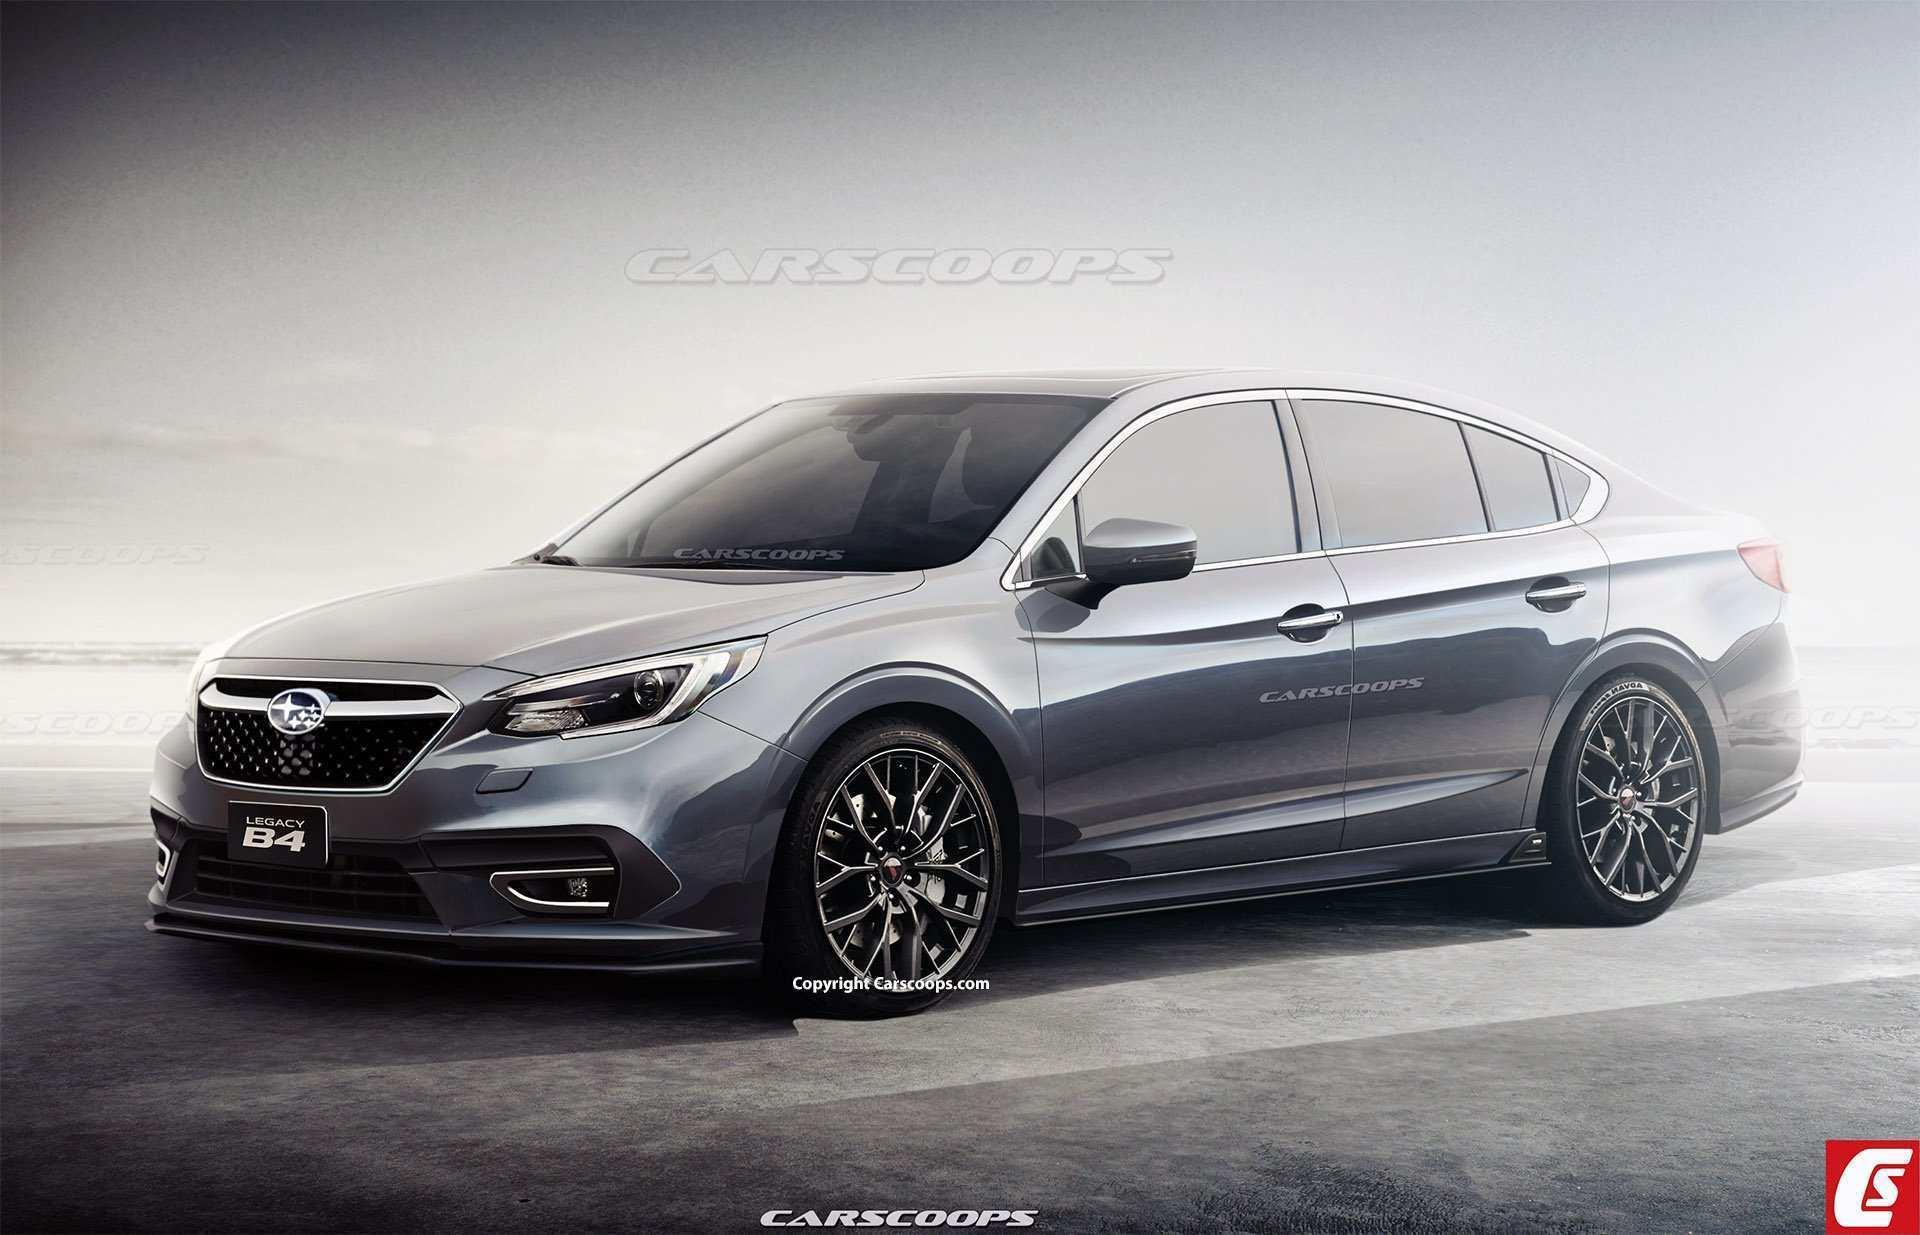 32 Best Review Subaru 2020 Sedan Price and Review by Subaru 2020 Sedan